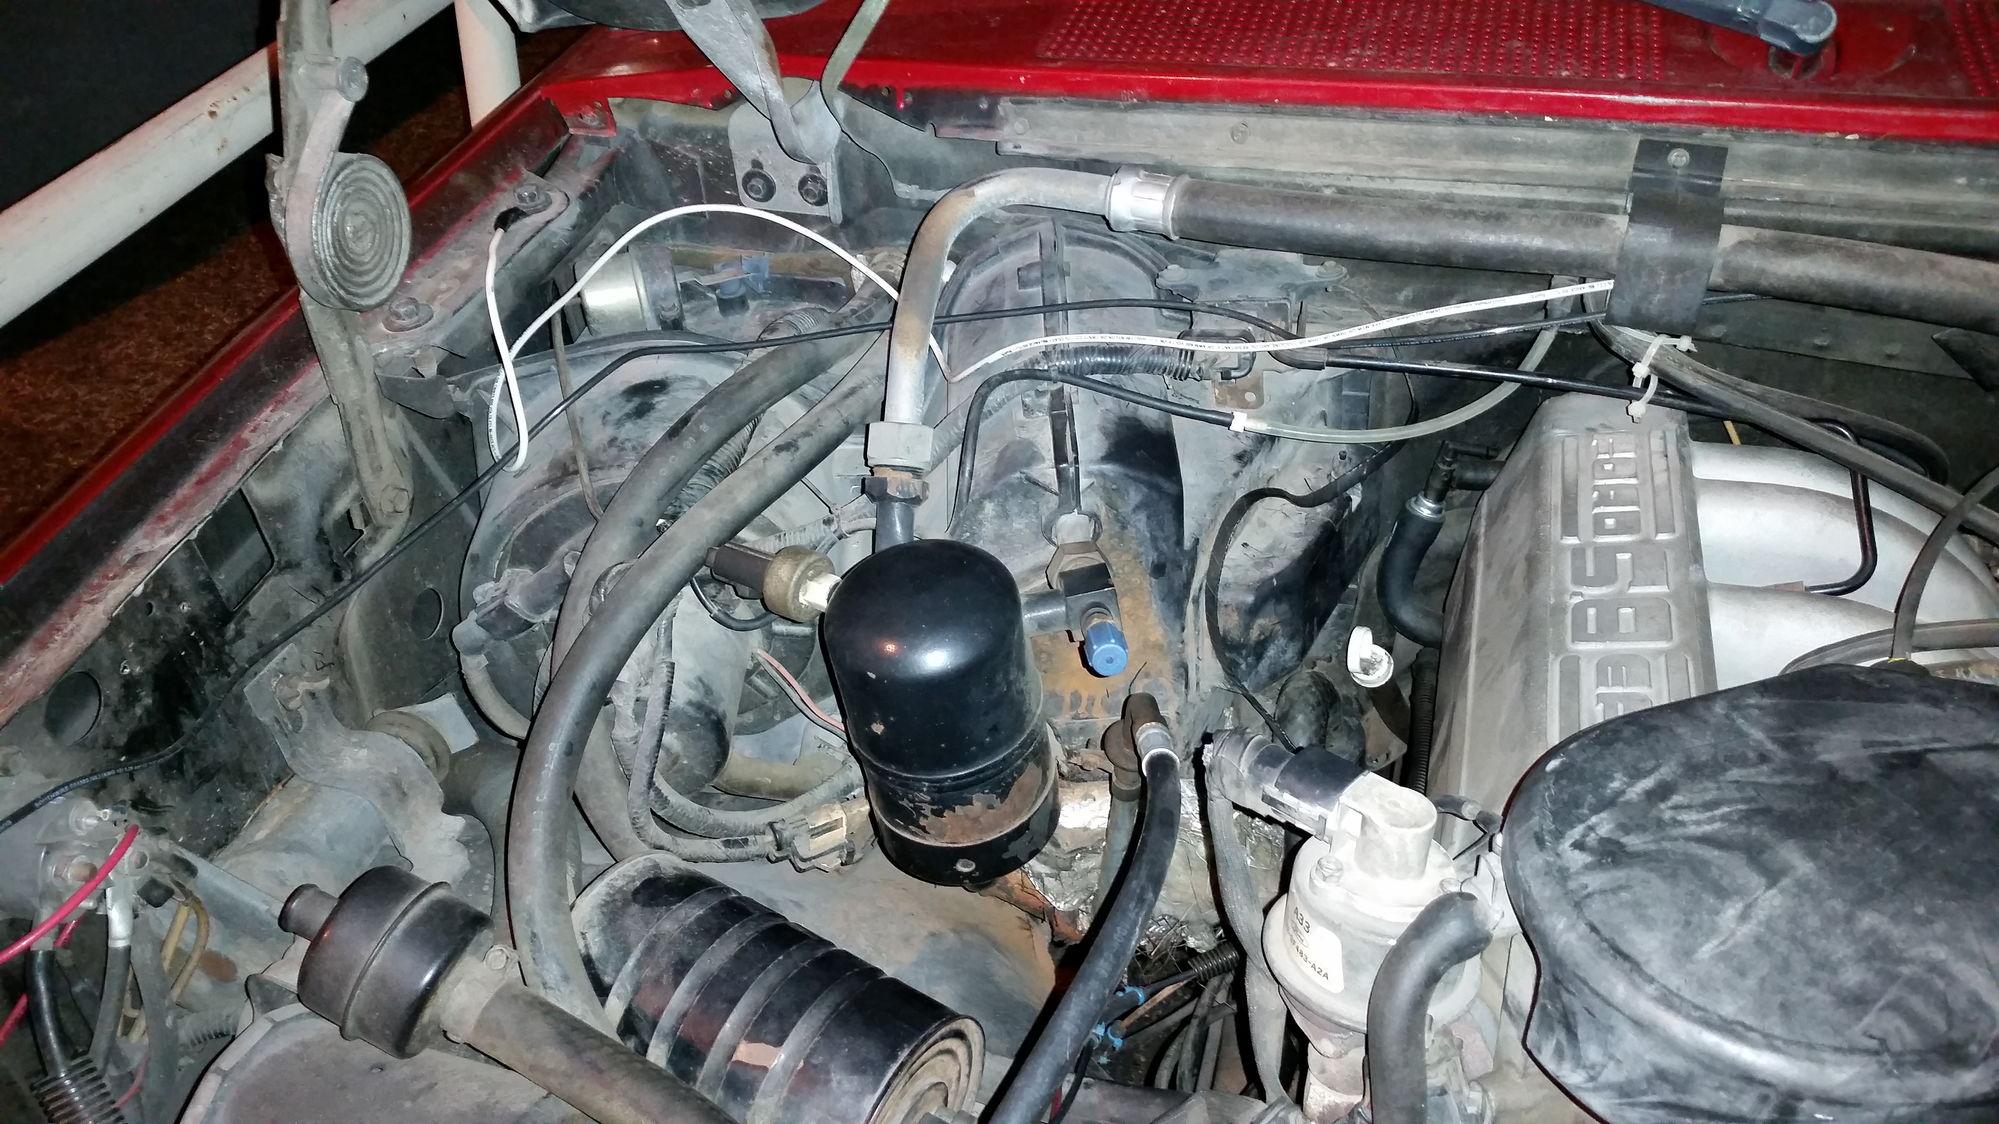 Bronco2accessories Ford Bronco 2 1989 Ford Bronco 5 0 Engine Diagram